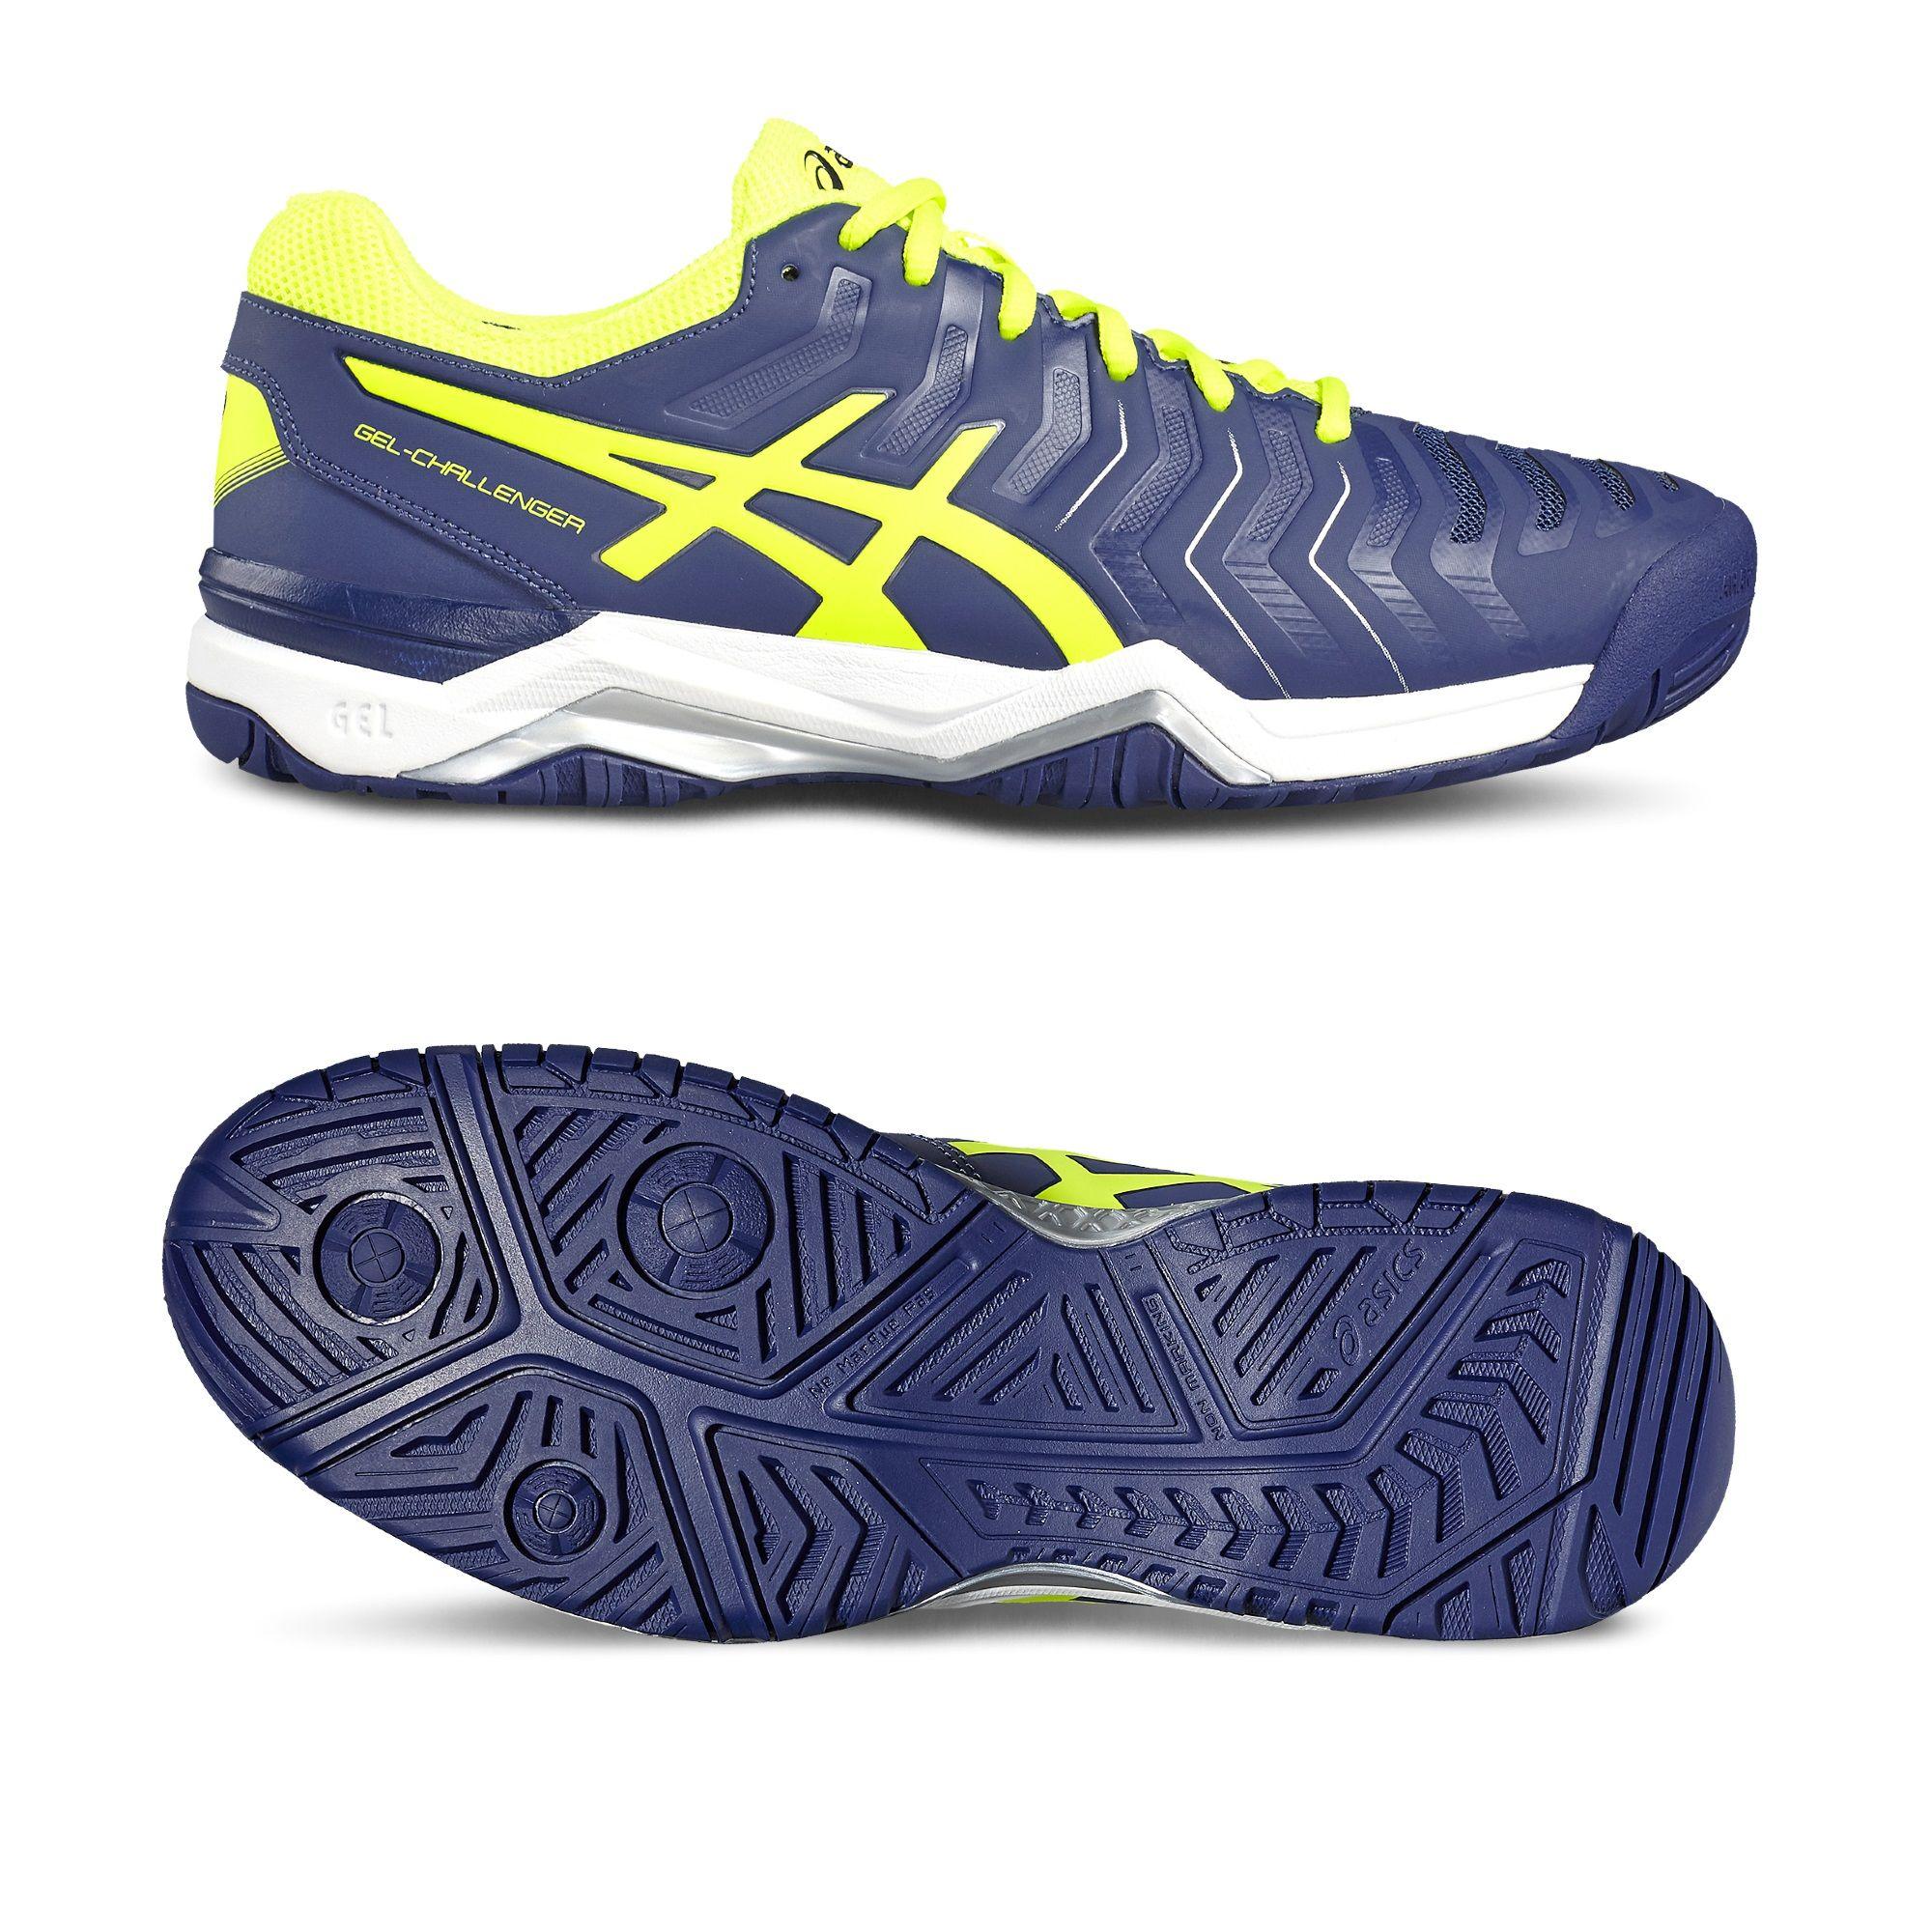 asics gel challenger 11 mens tennis shoes